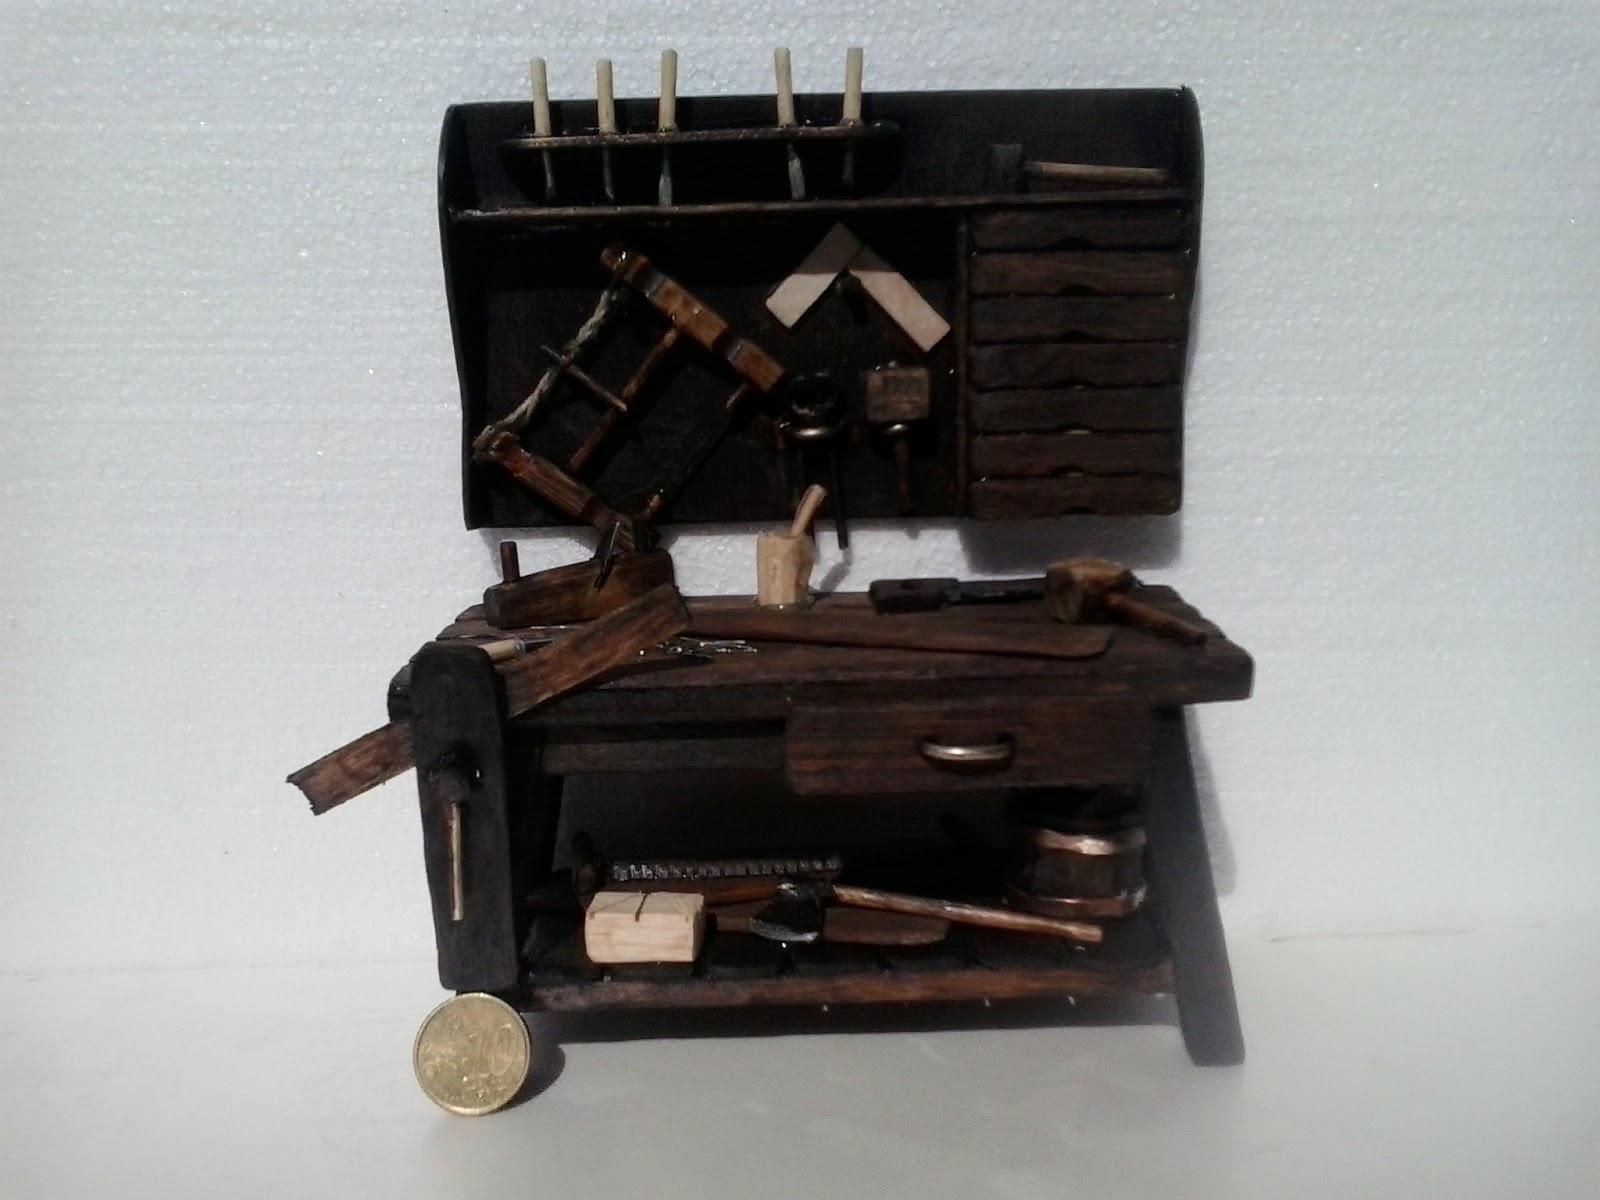 Bel n artesano mesa carpintero para figuras de 14 cm for Mesa de carpintero